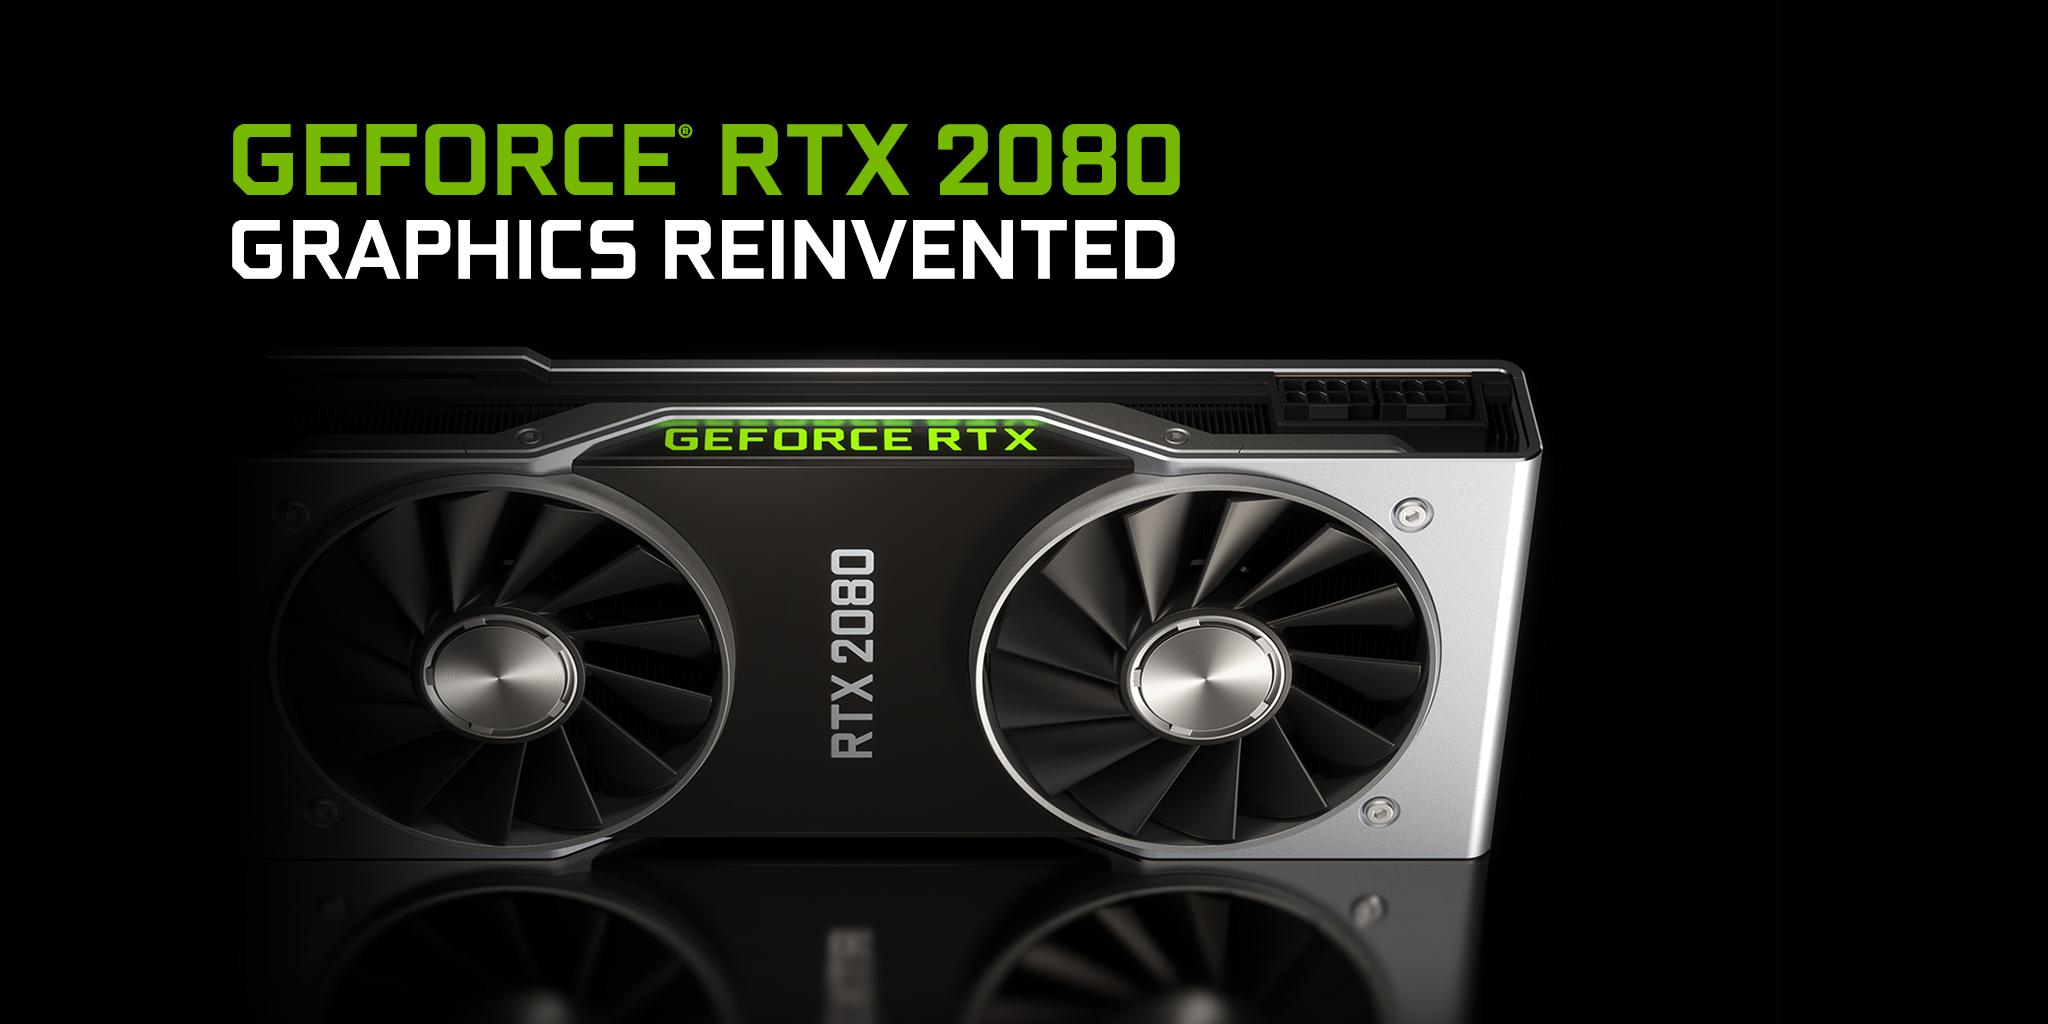 RTX 2080 graphics card